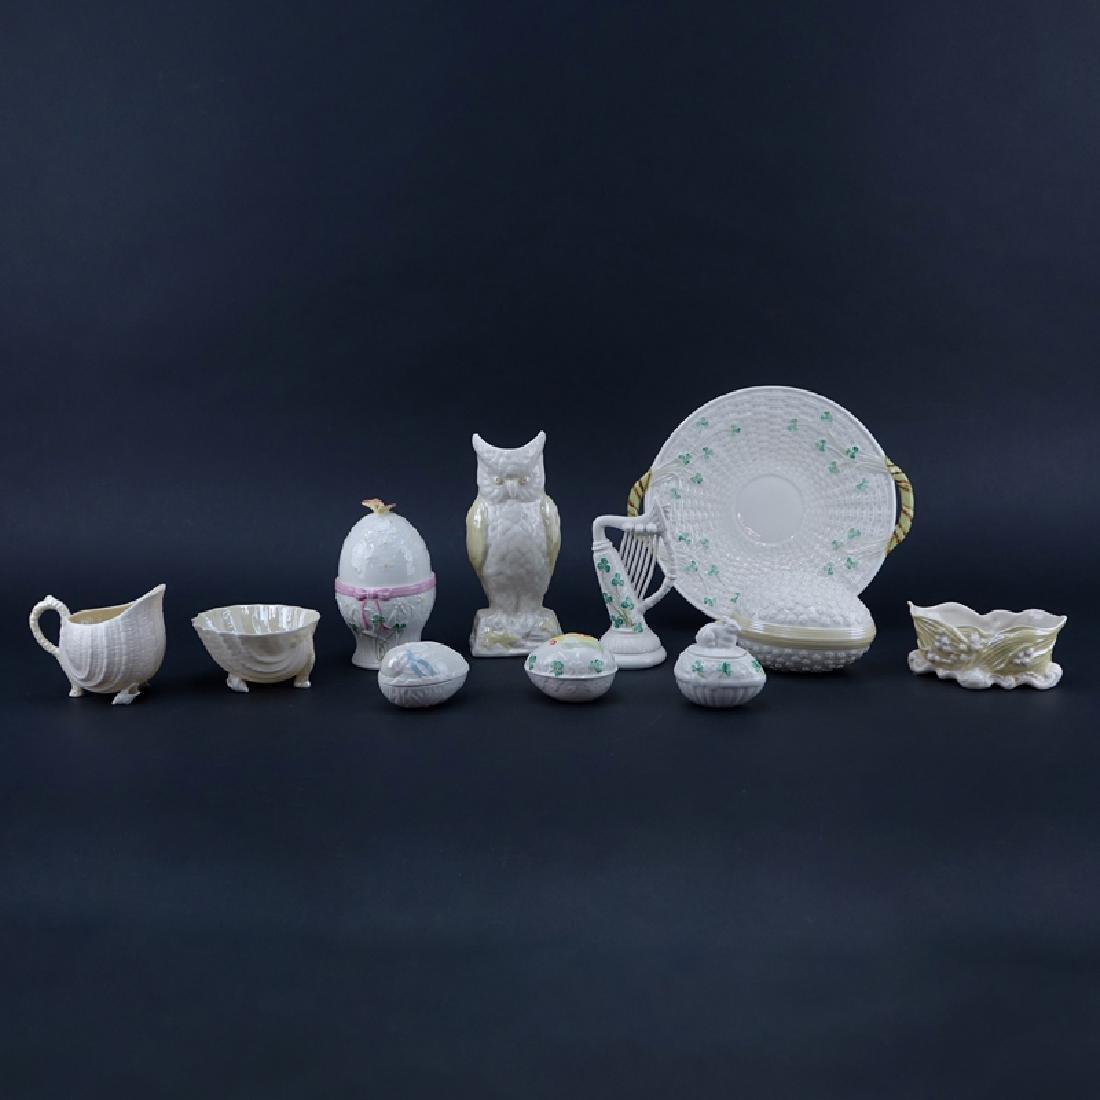 Collection of Eleven (11) Belleek Porcelain Tableware.